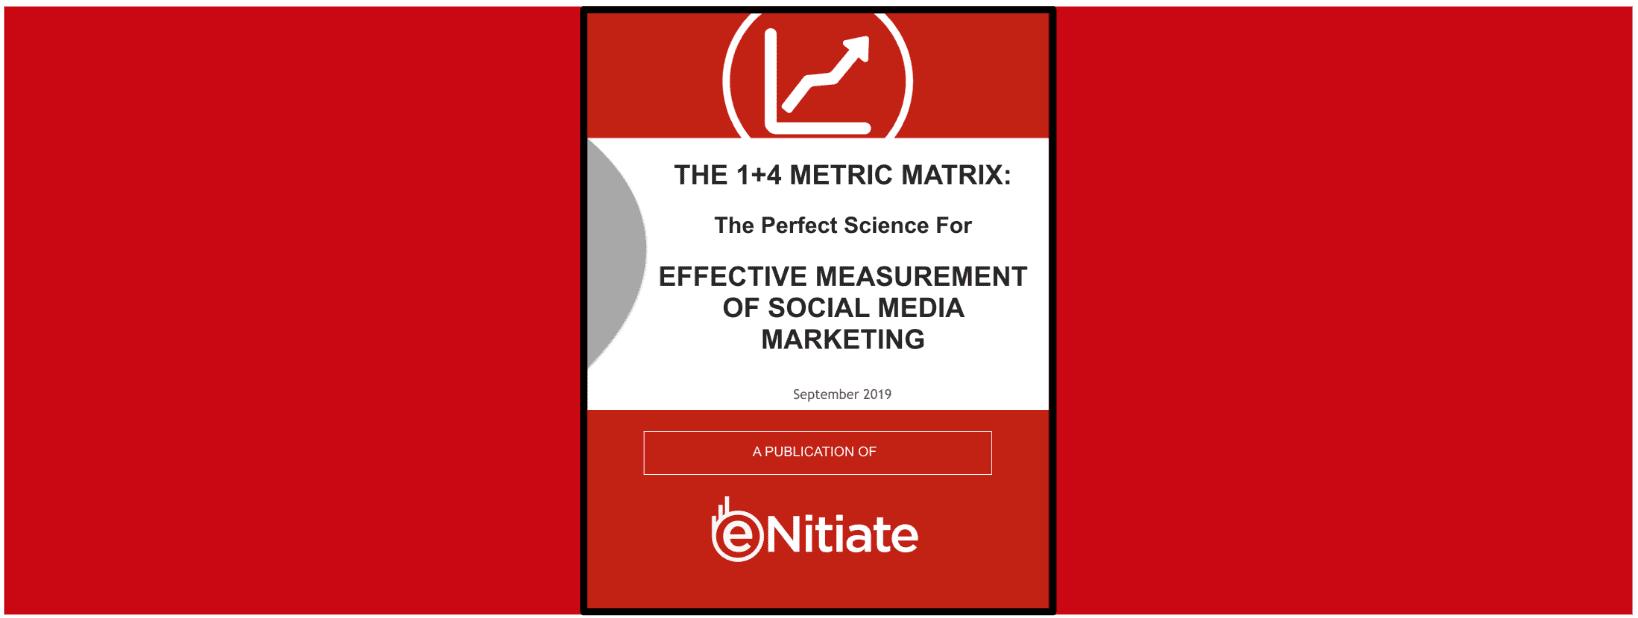 eBook: 1+4 Metric Matrix 2019